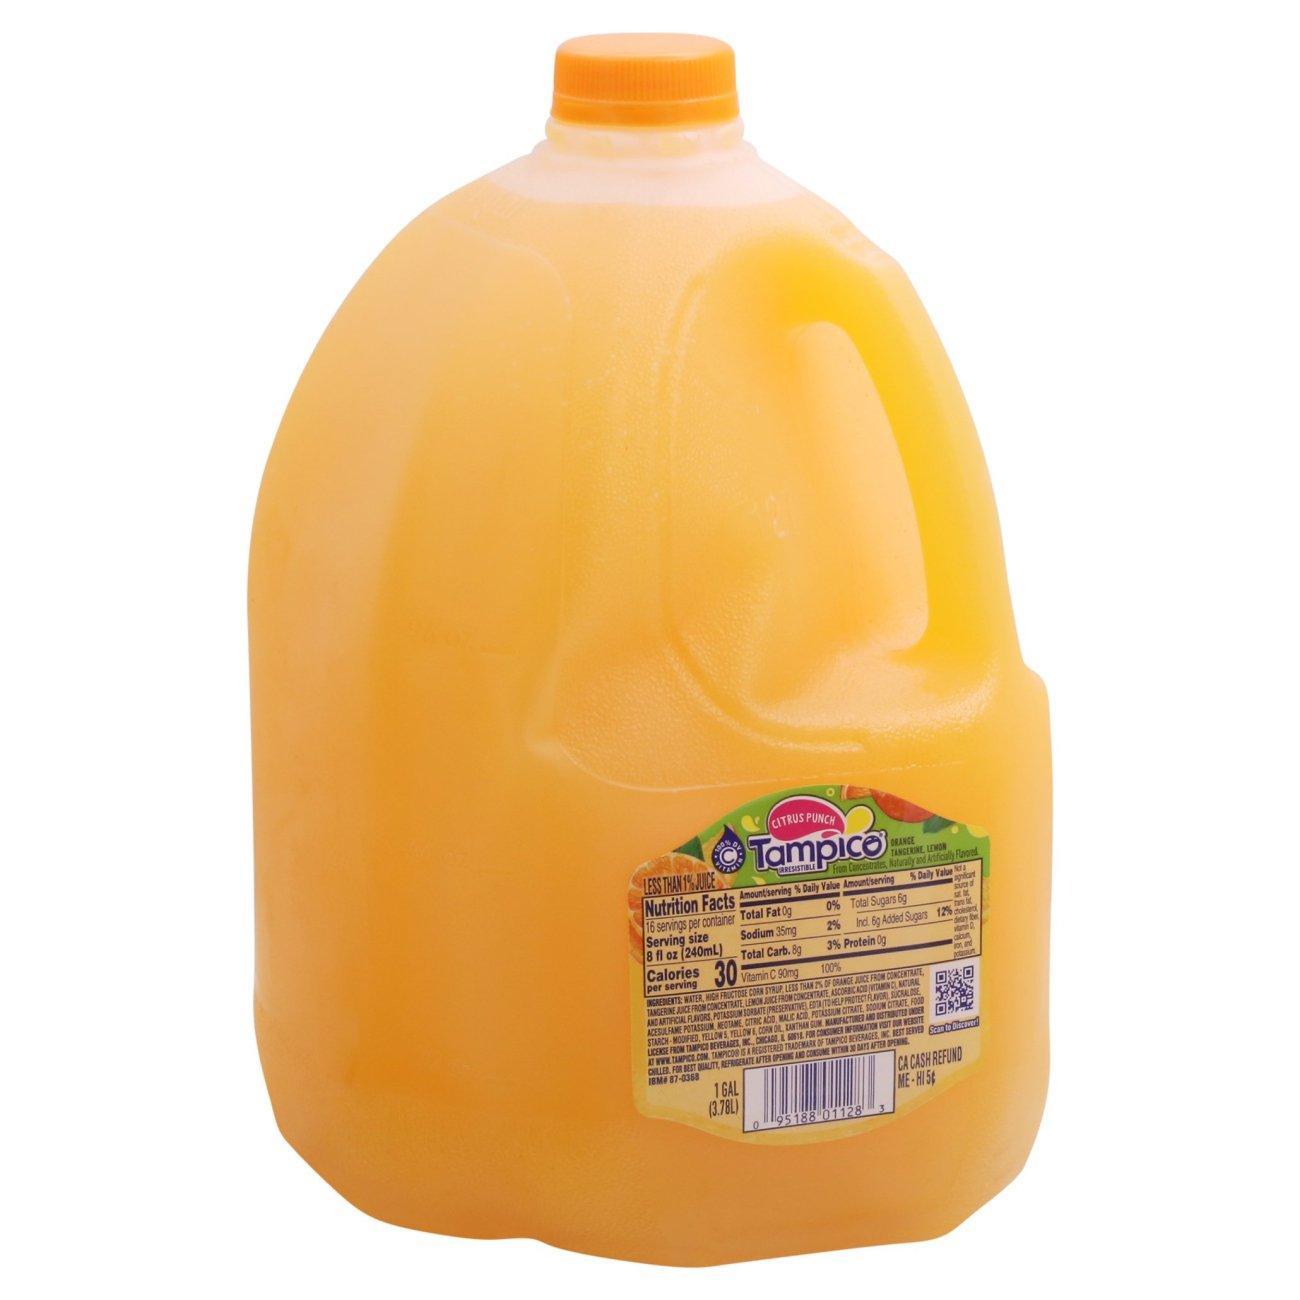 Tampico Citrus Punch - Shop Juice at H-E-B